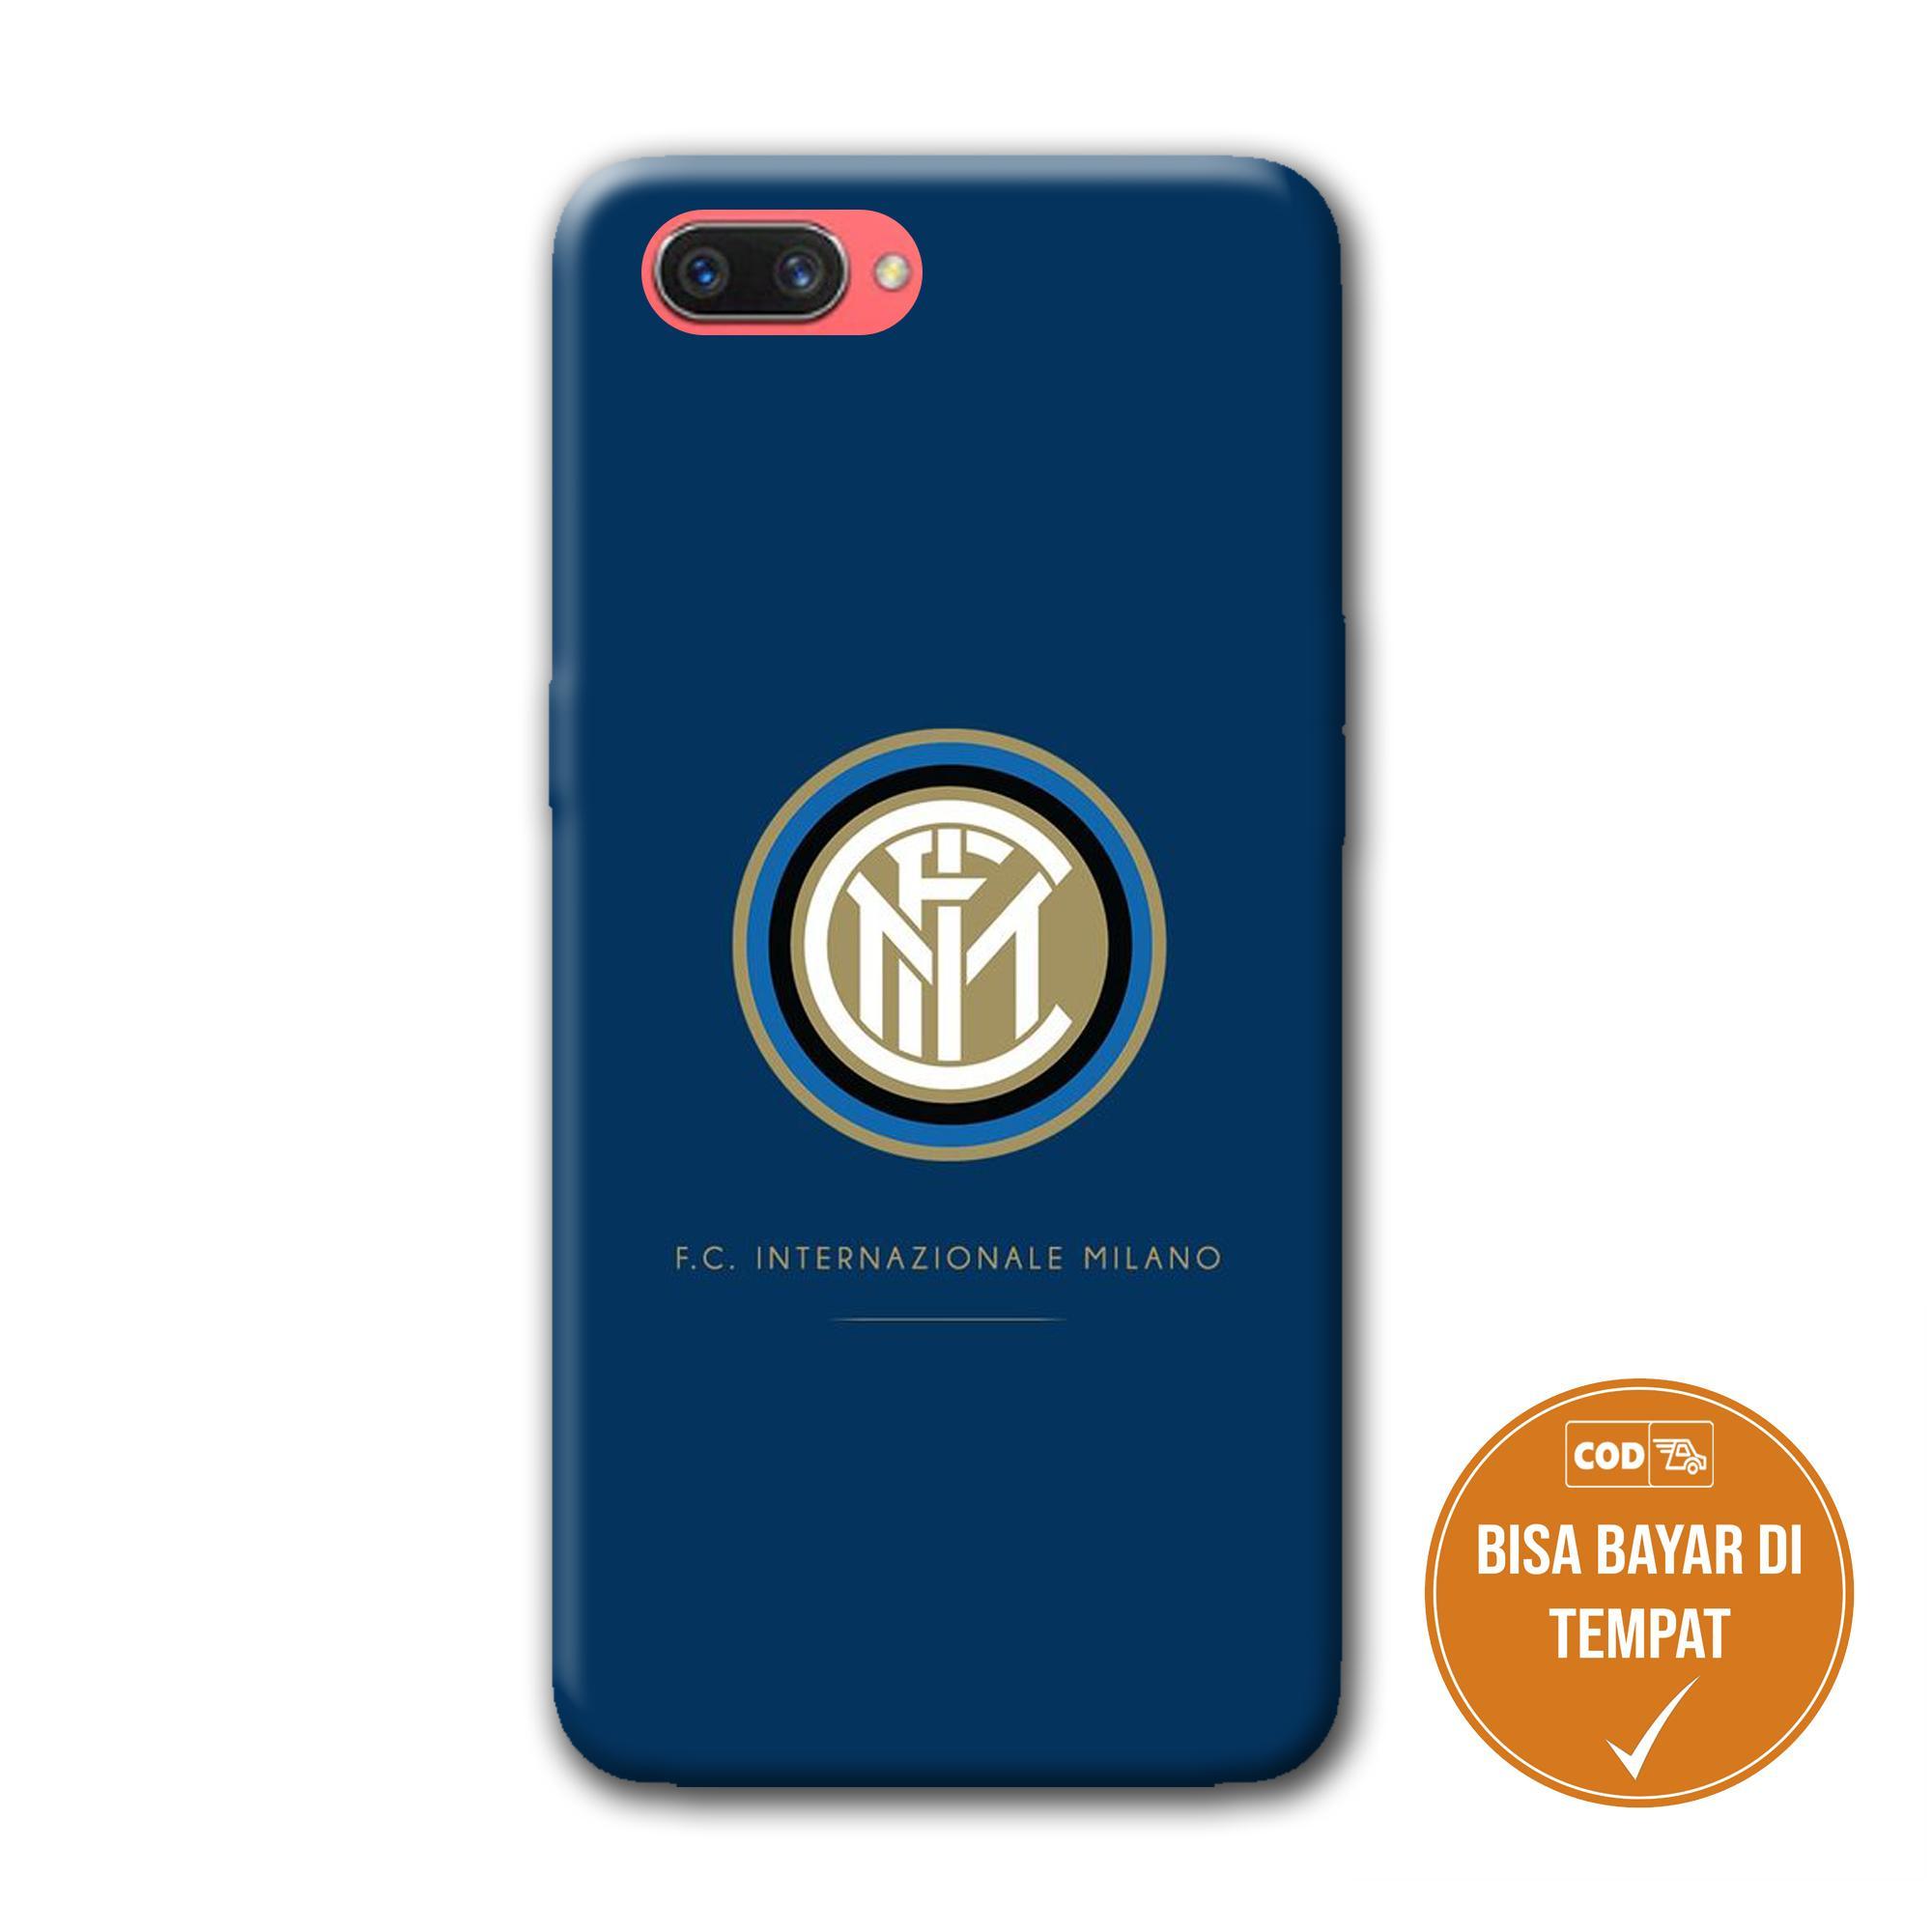 Case  Oppo A3s Football - Marinstore Pelindung Hp, Case Hp, Casing Handphone - BIsa COD/ Bayar DItempat paling murah paling bagus